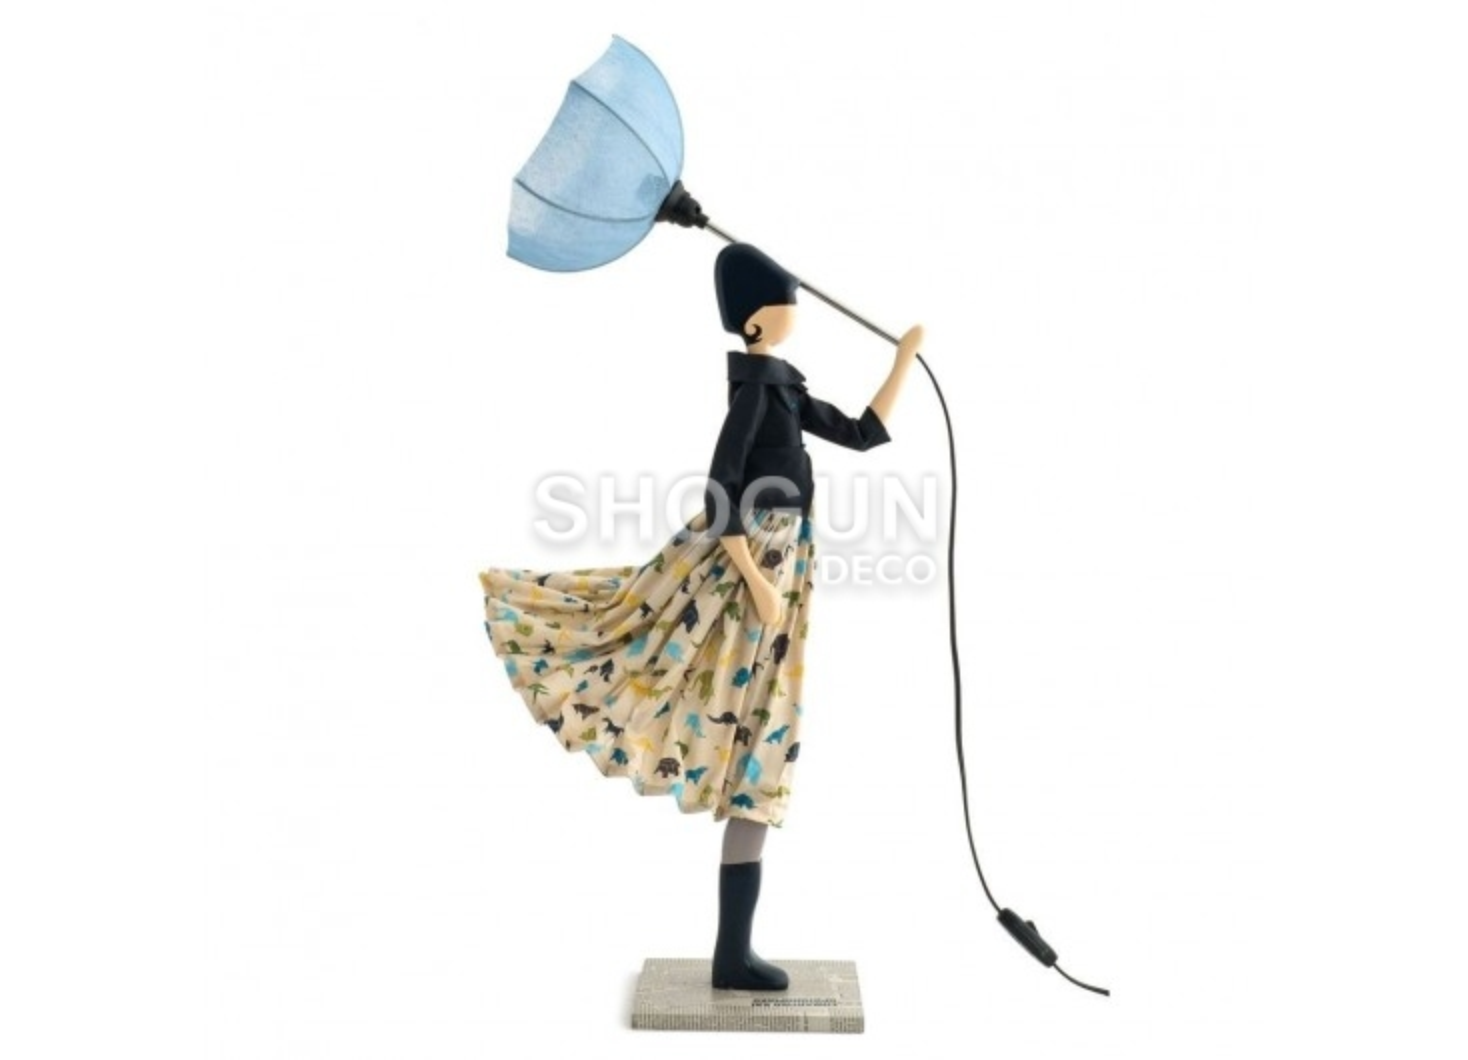 Lampe Zaoli - fille au parapluie